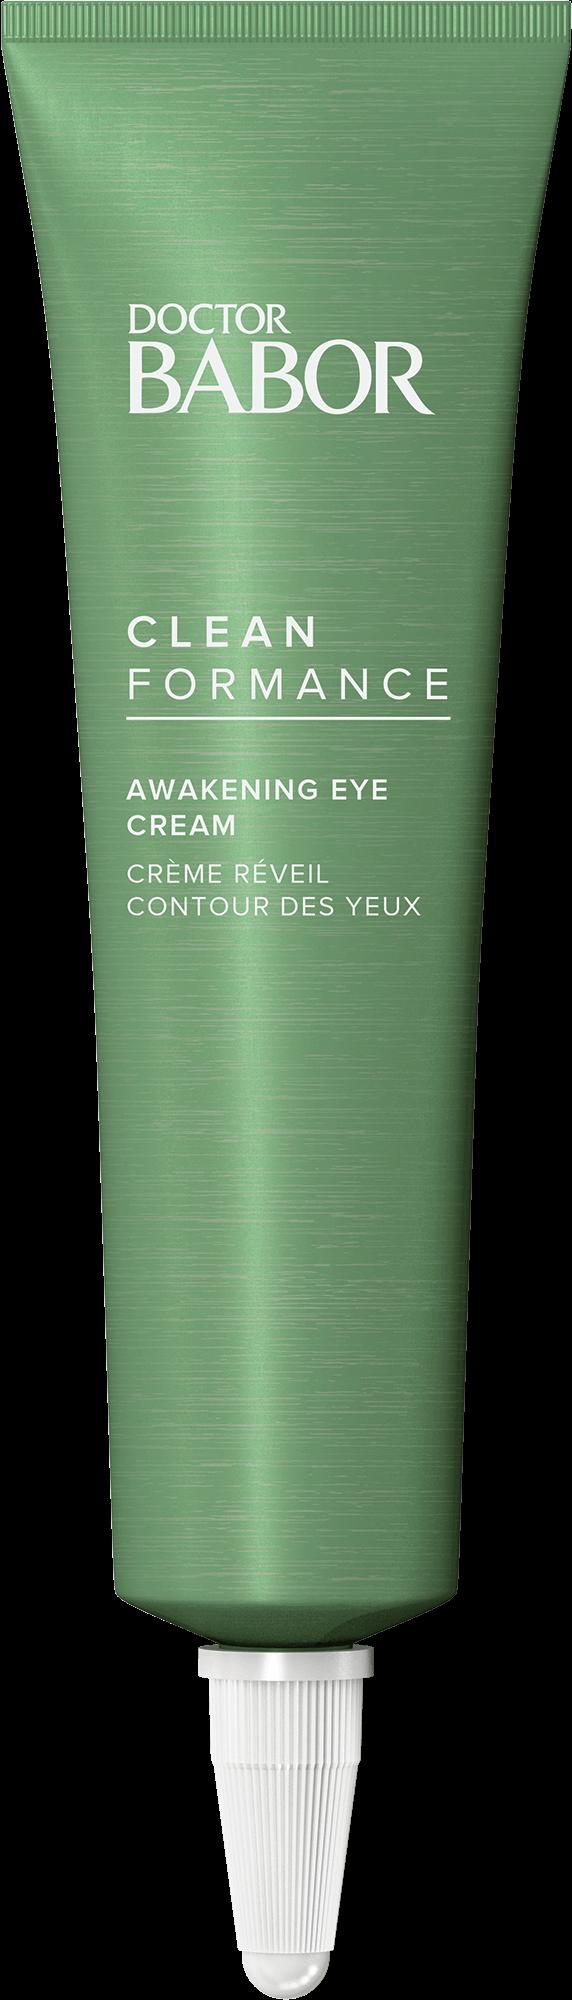 DOCTOR BABOR CLEANFORMANCE Awakening Eye Cream